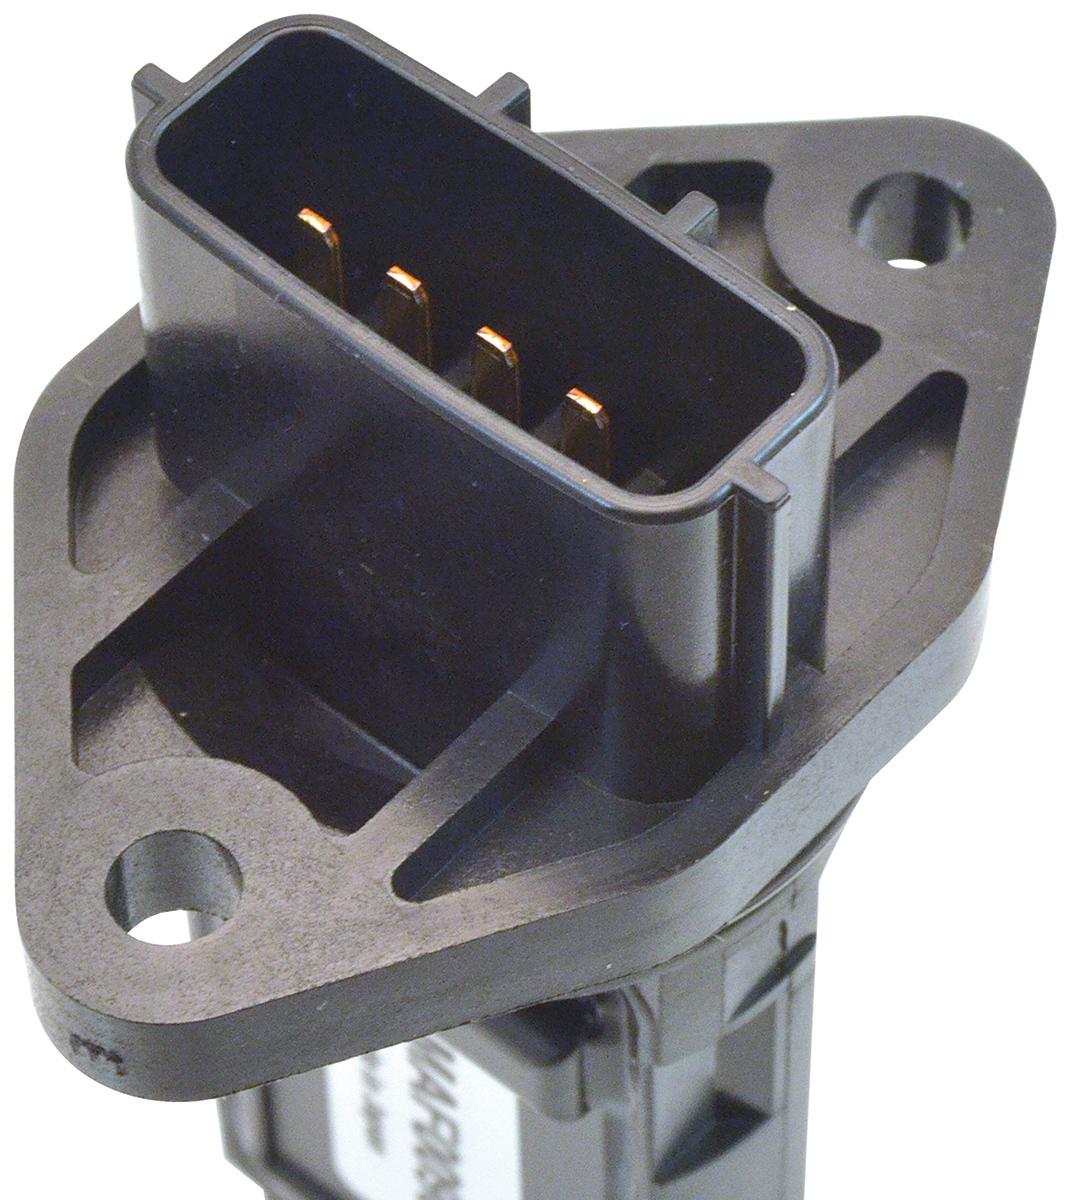 Mass Air Flow Sensor Hitachi Automotive Systems Americas Inc Maf Wiring Diagram Audi A4 98 1 8